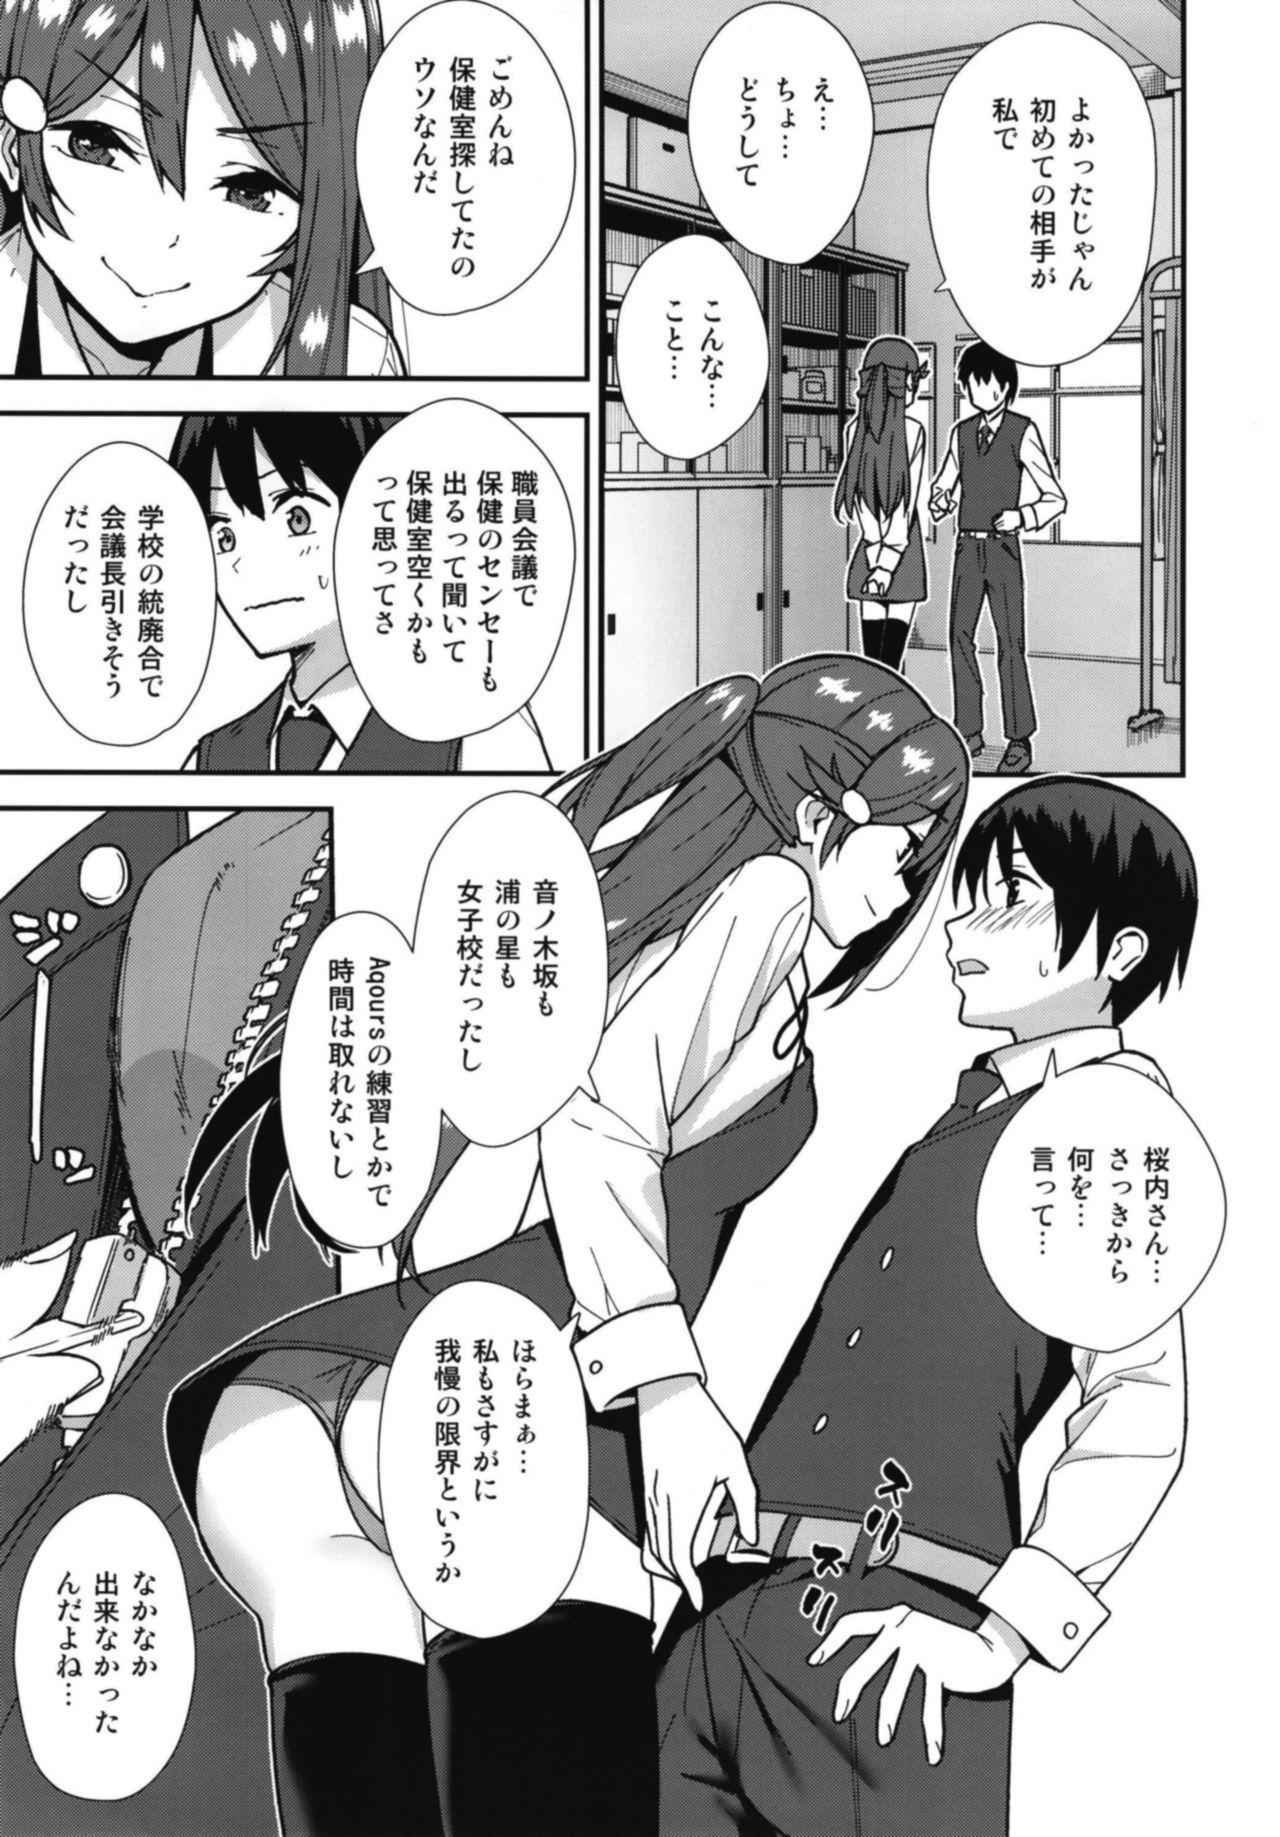 Kyou kara Hajimaru Sex Life - Start in my brand new SEX life. 6